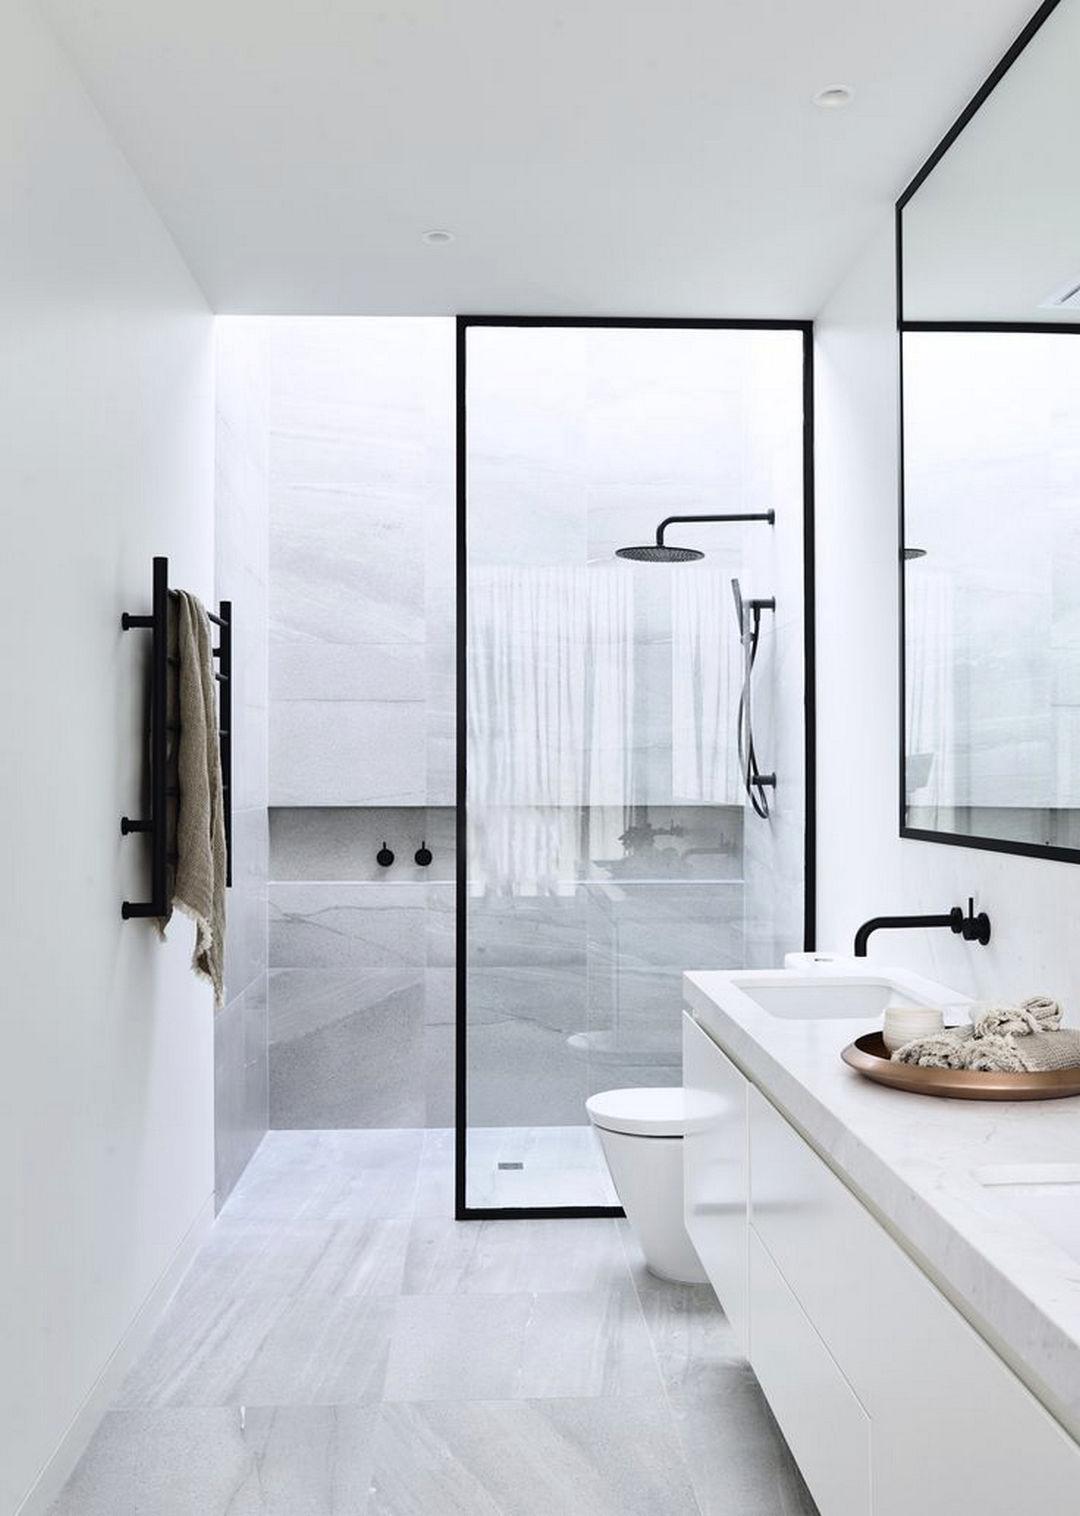 Modern Bathroom Interior Designs 100 Fascinating Photos